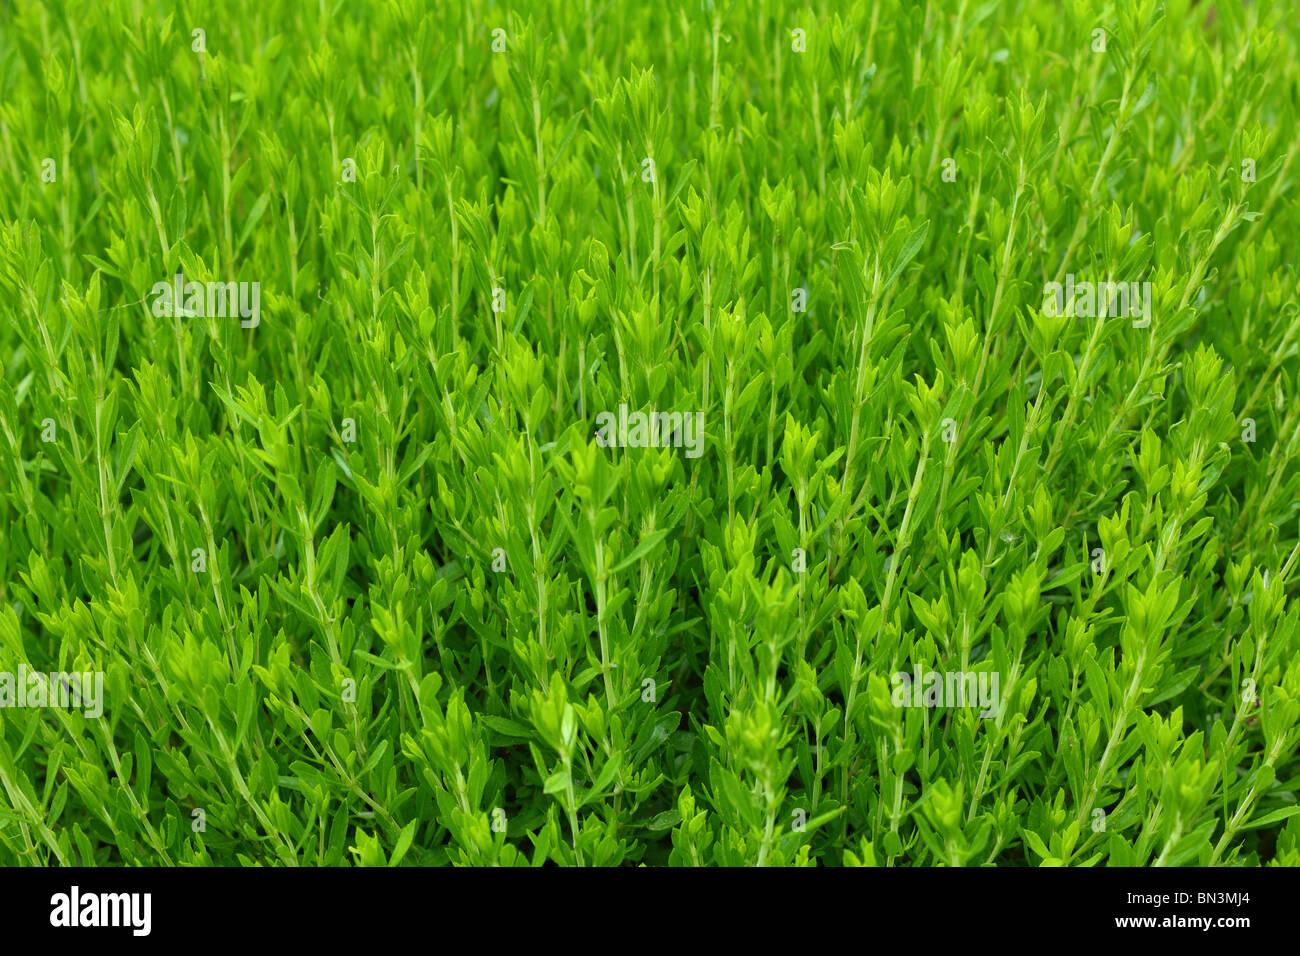 Bohnenkraut Satureja Montana Herb frischen grünen Gewürz Stockbild